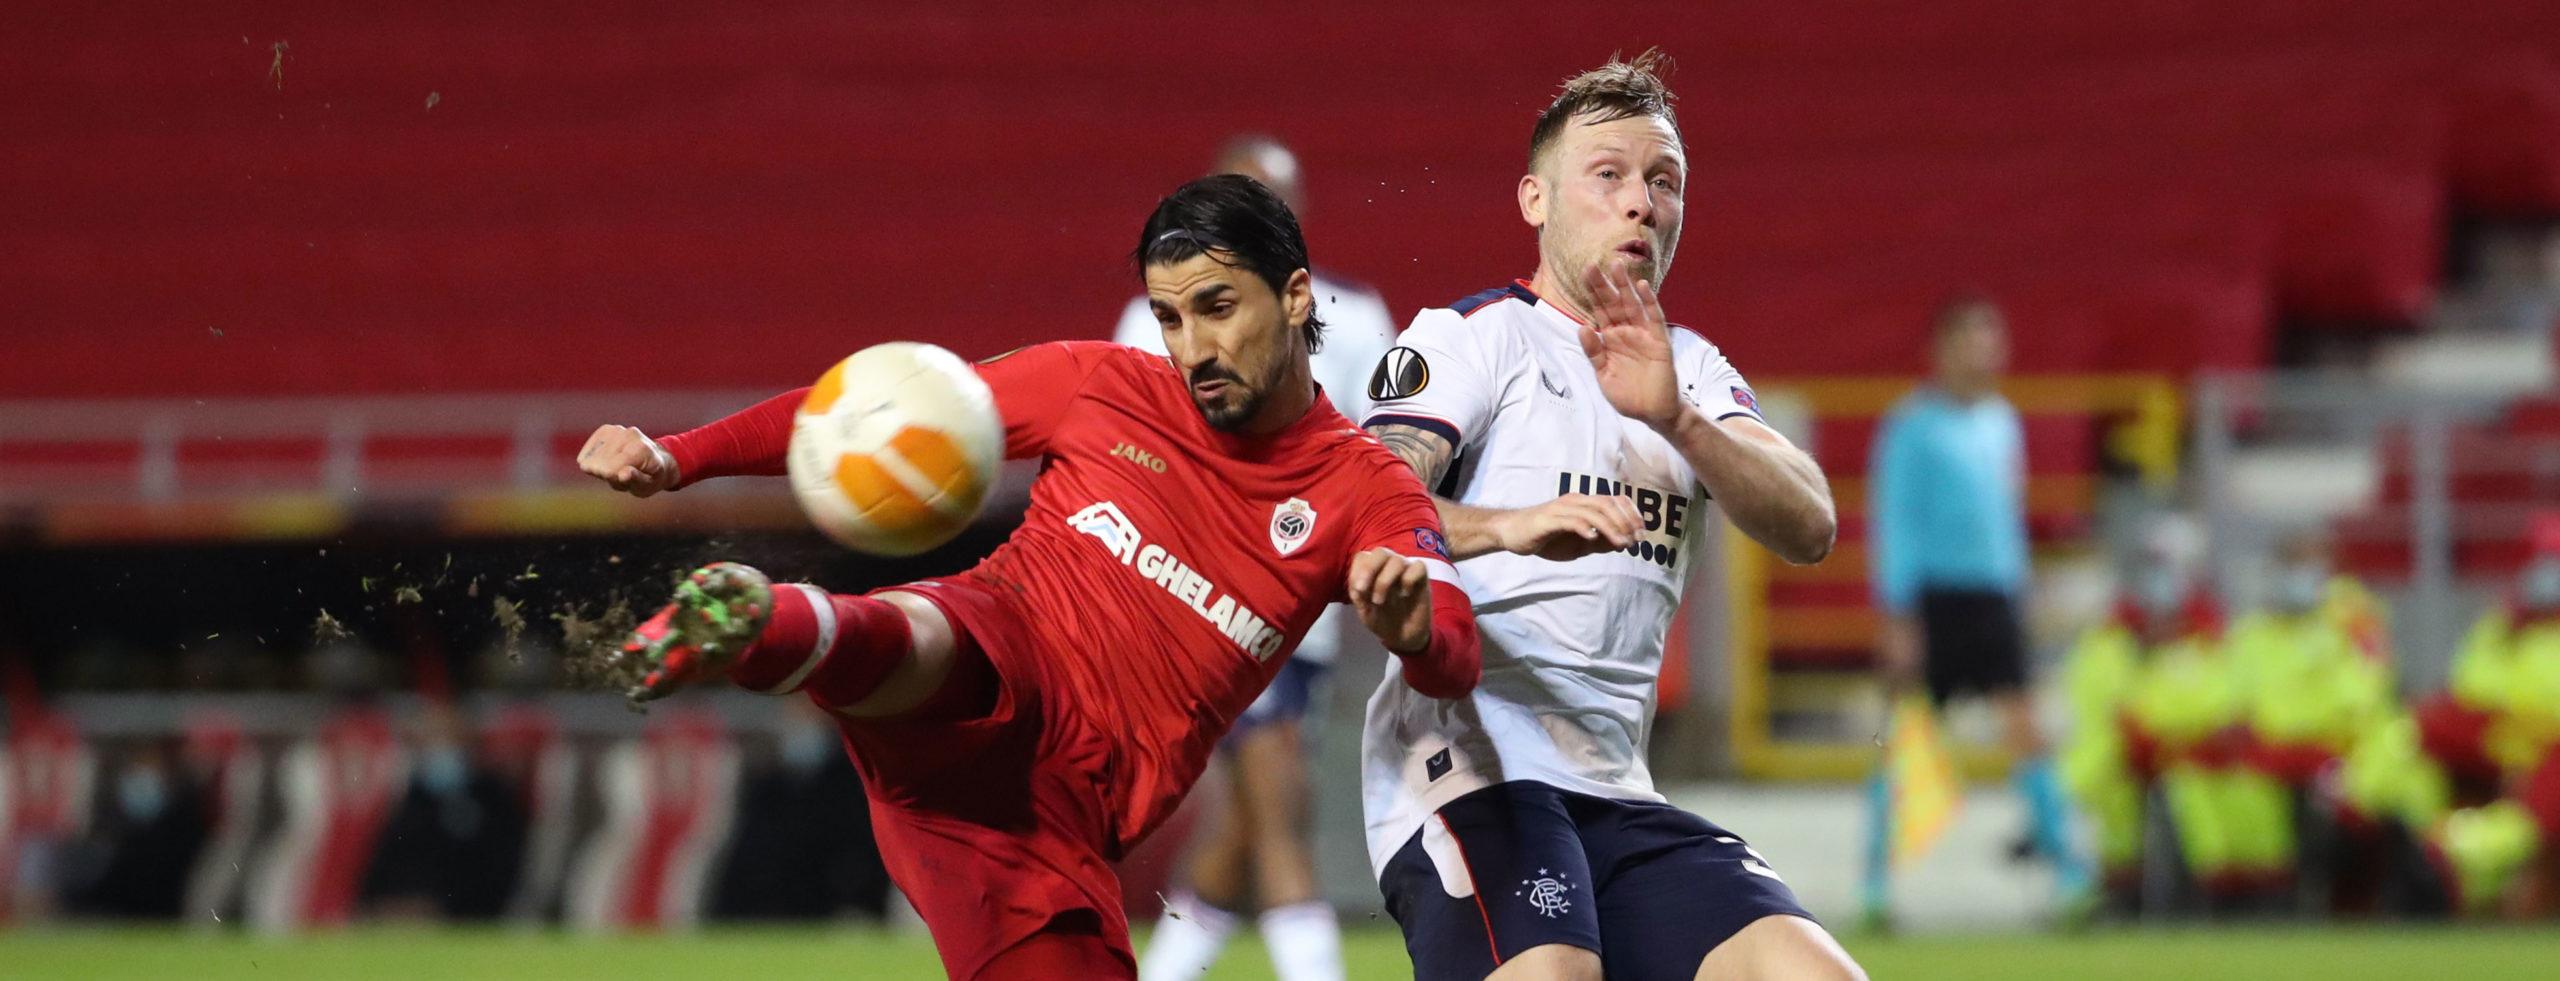 Rangers vs Antwerp: Goals galore again as Gers progress